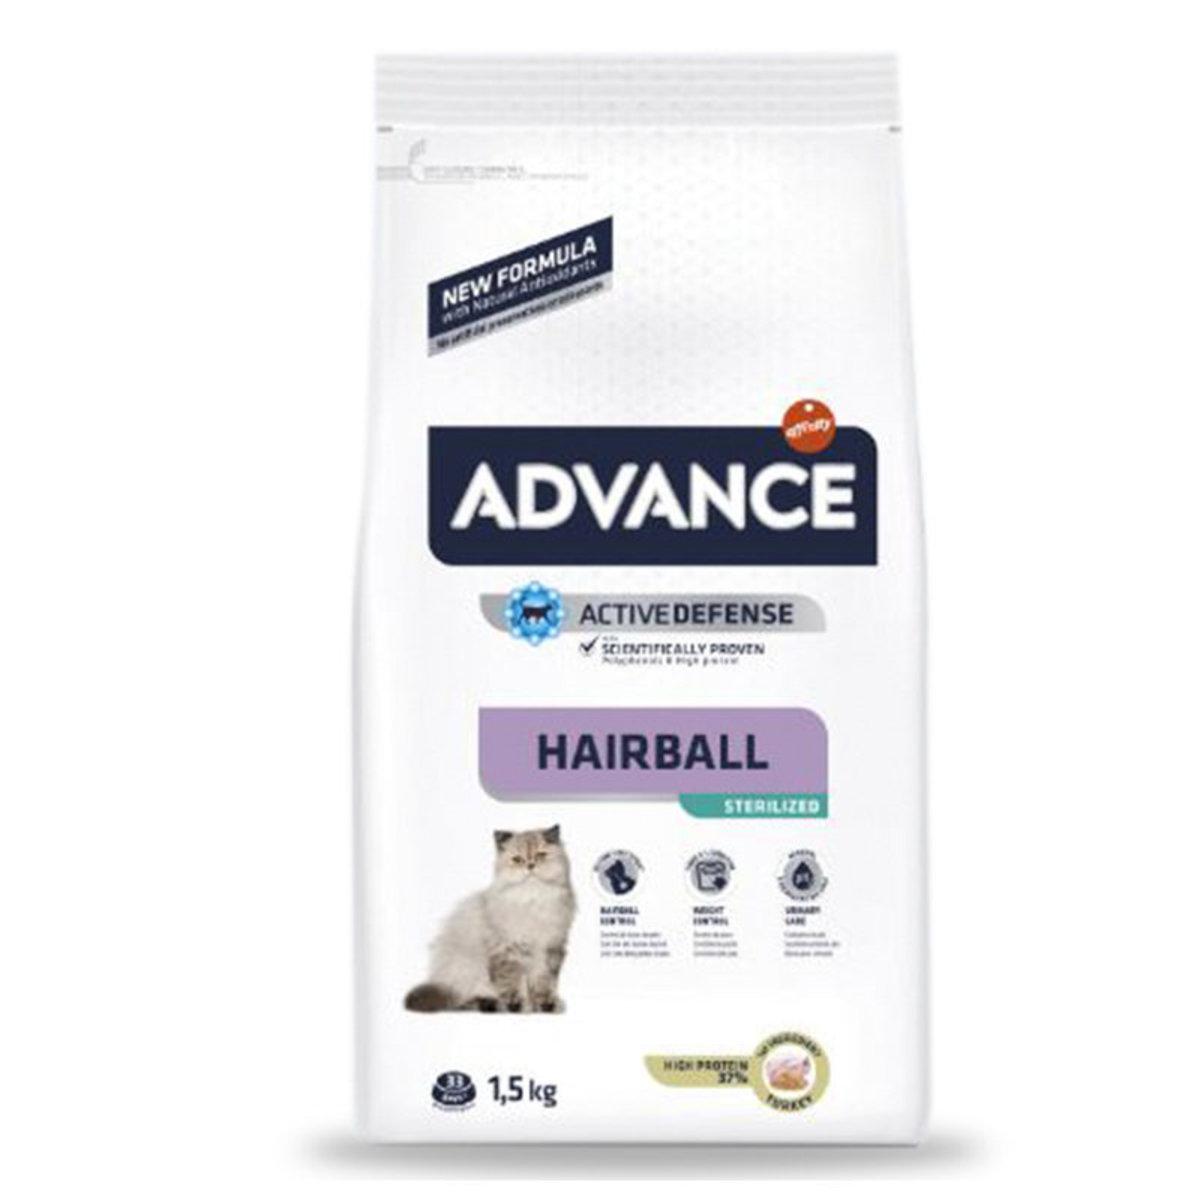 Advabce Activedefense Hairball